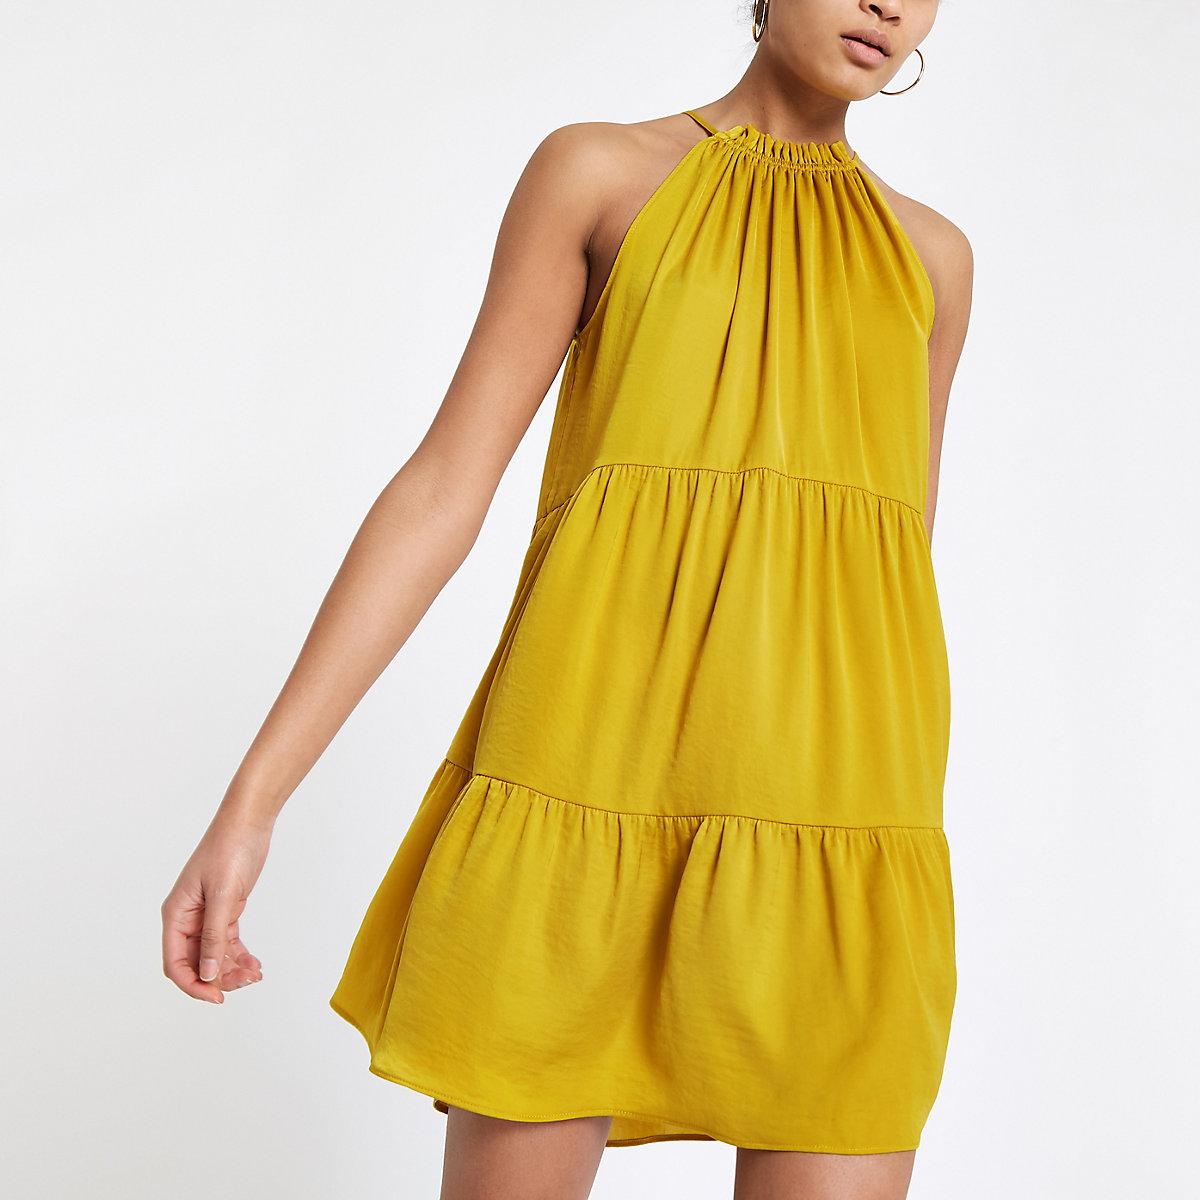 Yellow halter neck slip dress